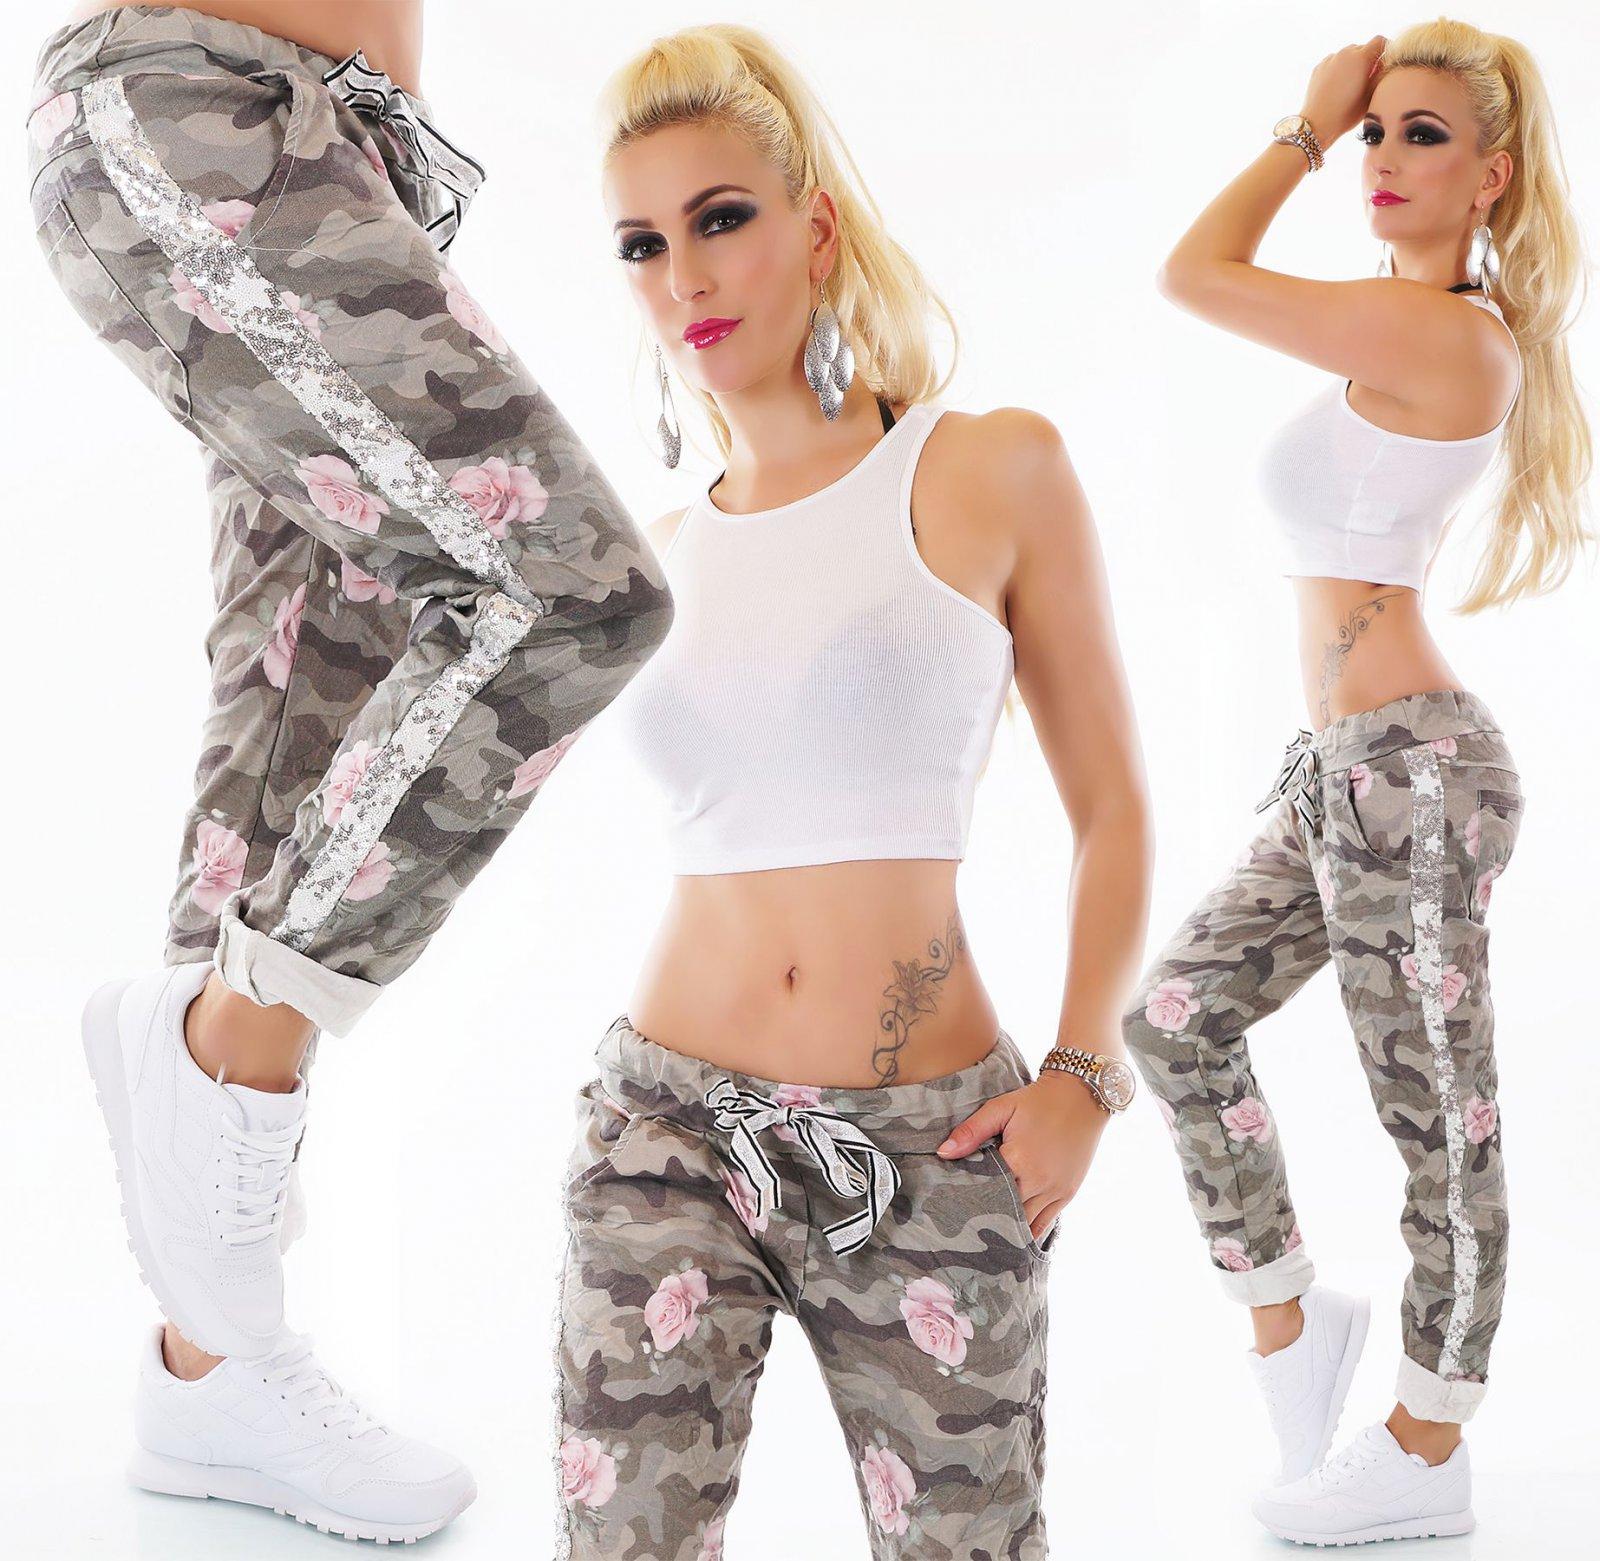 Details Sequins Trousers Boyfriend Womens Camouflage Original Flower 40 Title Show Jeans Baggy About 36 Italy Pants T1KlJc3F